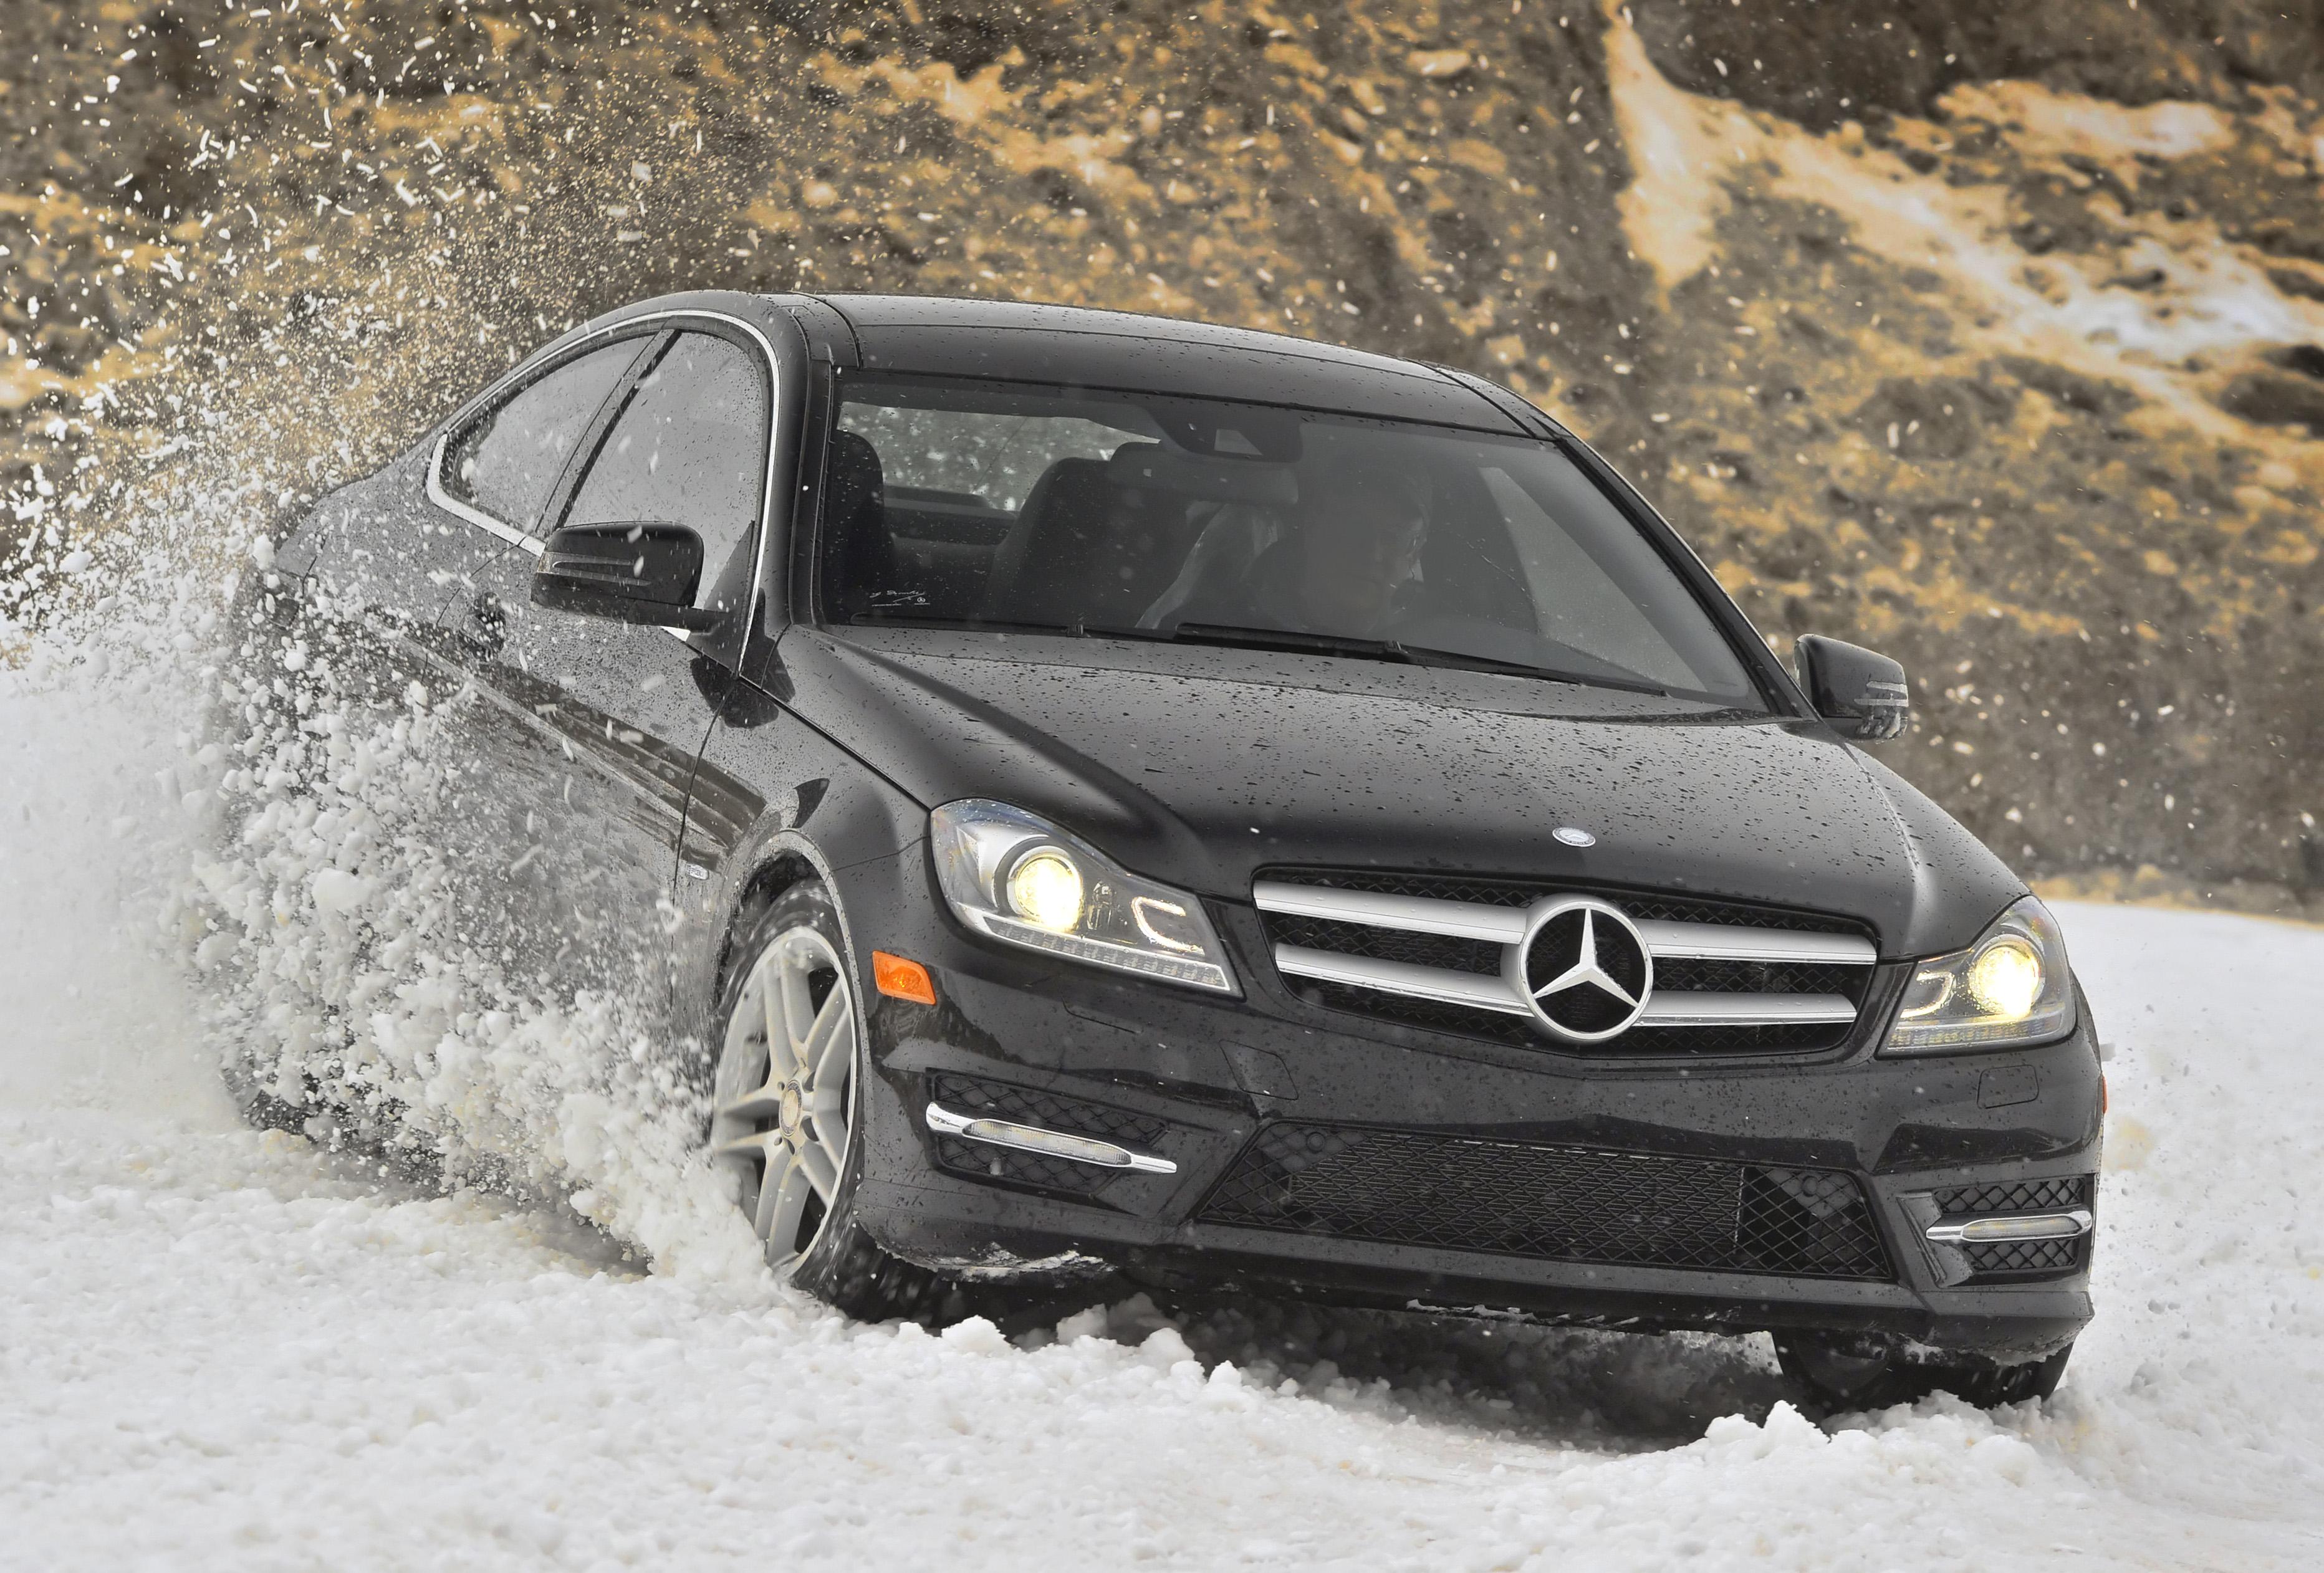 2012 MercedesBenz C350 4Matic Coupe Walkaround Video